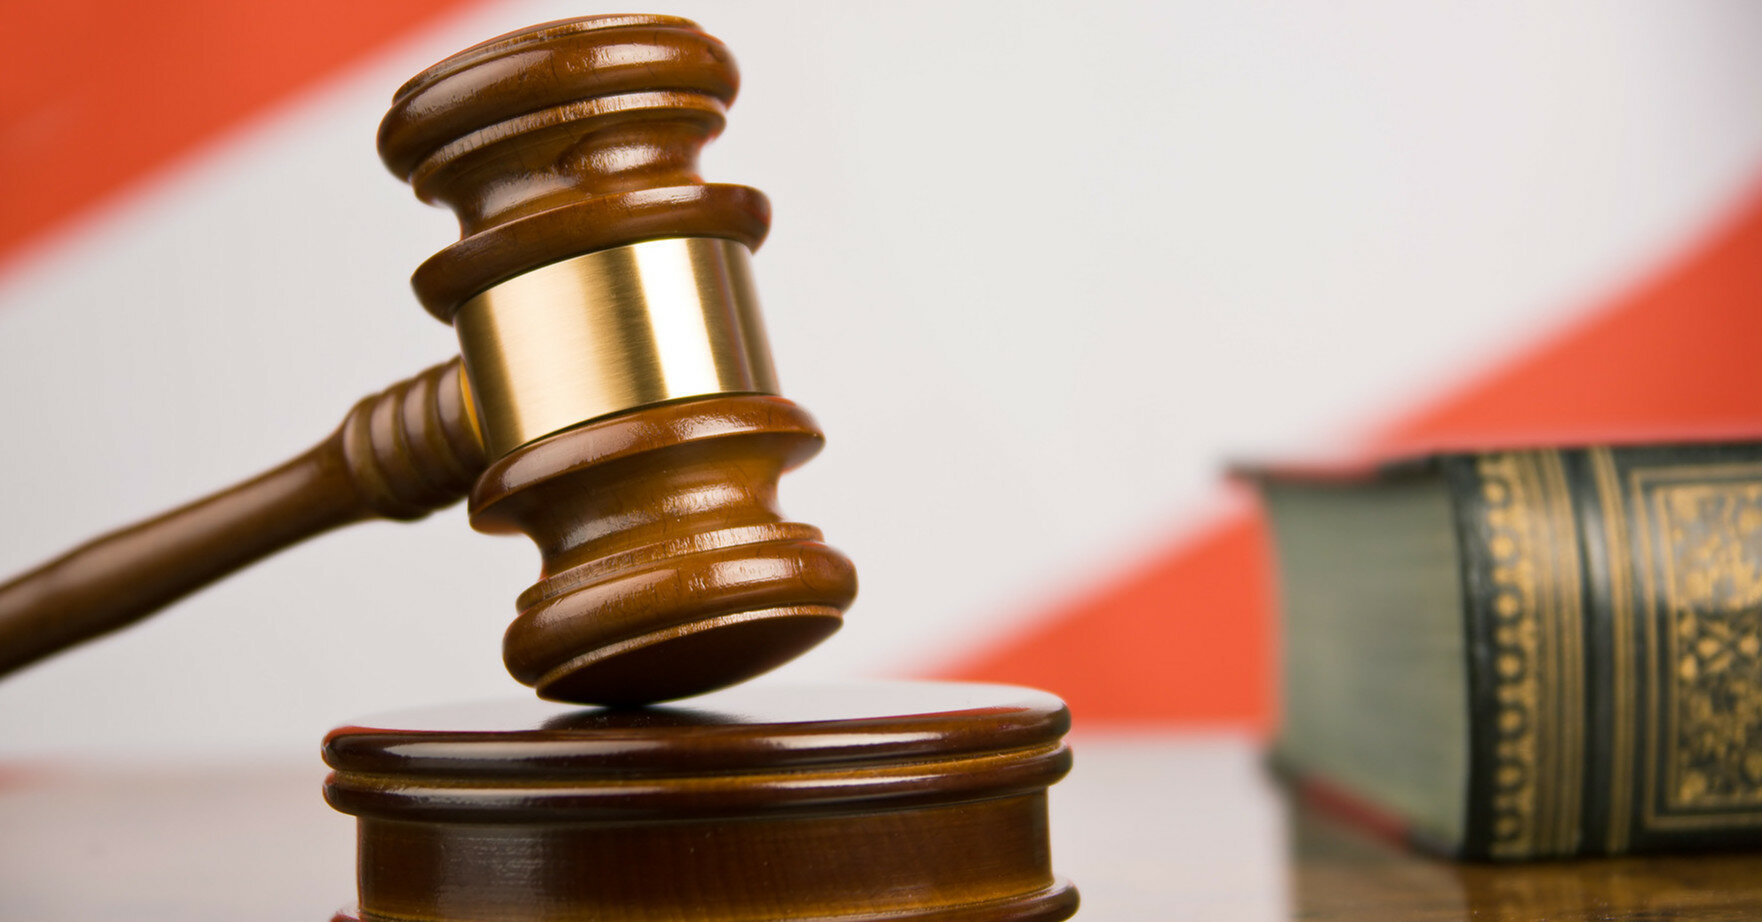 Мужчина, который ударил Макрона, предстанет перед судом